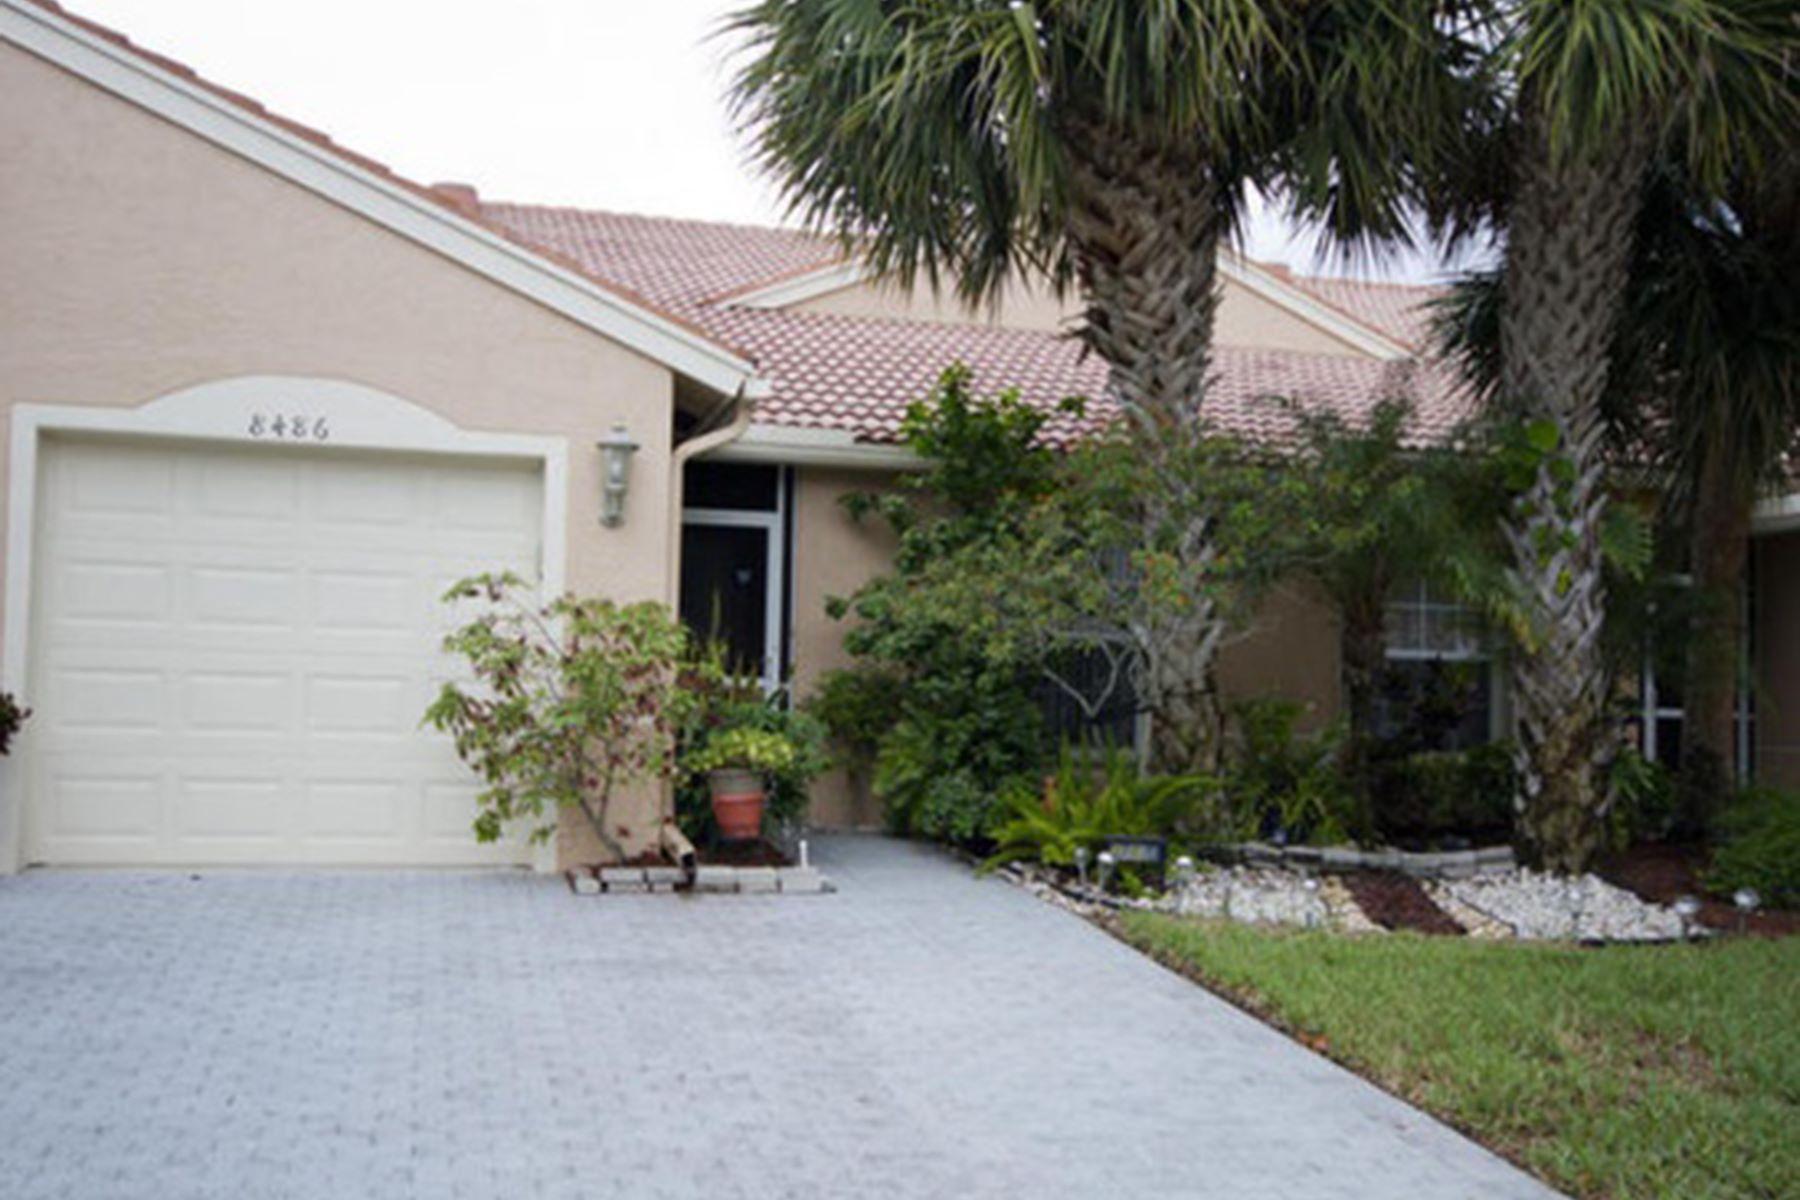 Townhouse for Sale at 8486 Logia Circle 8486 Logia Circle Boynton Beach, Florida 33472 United States